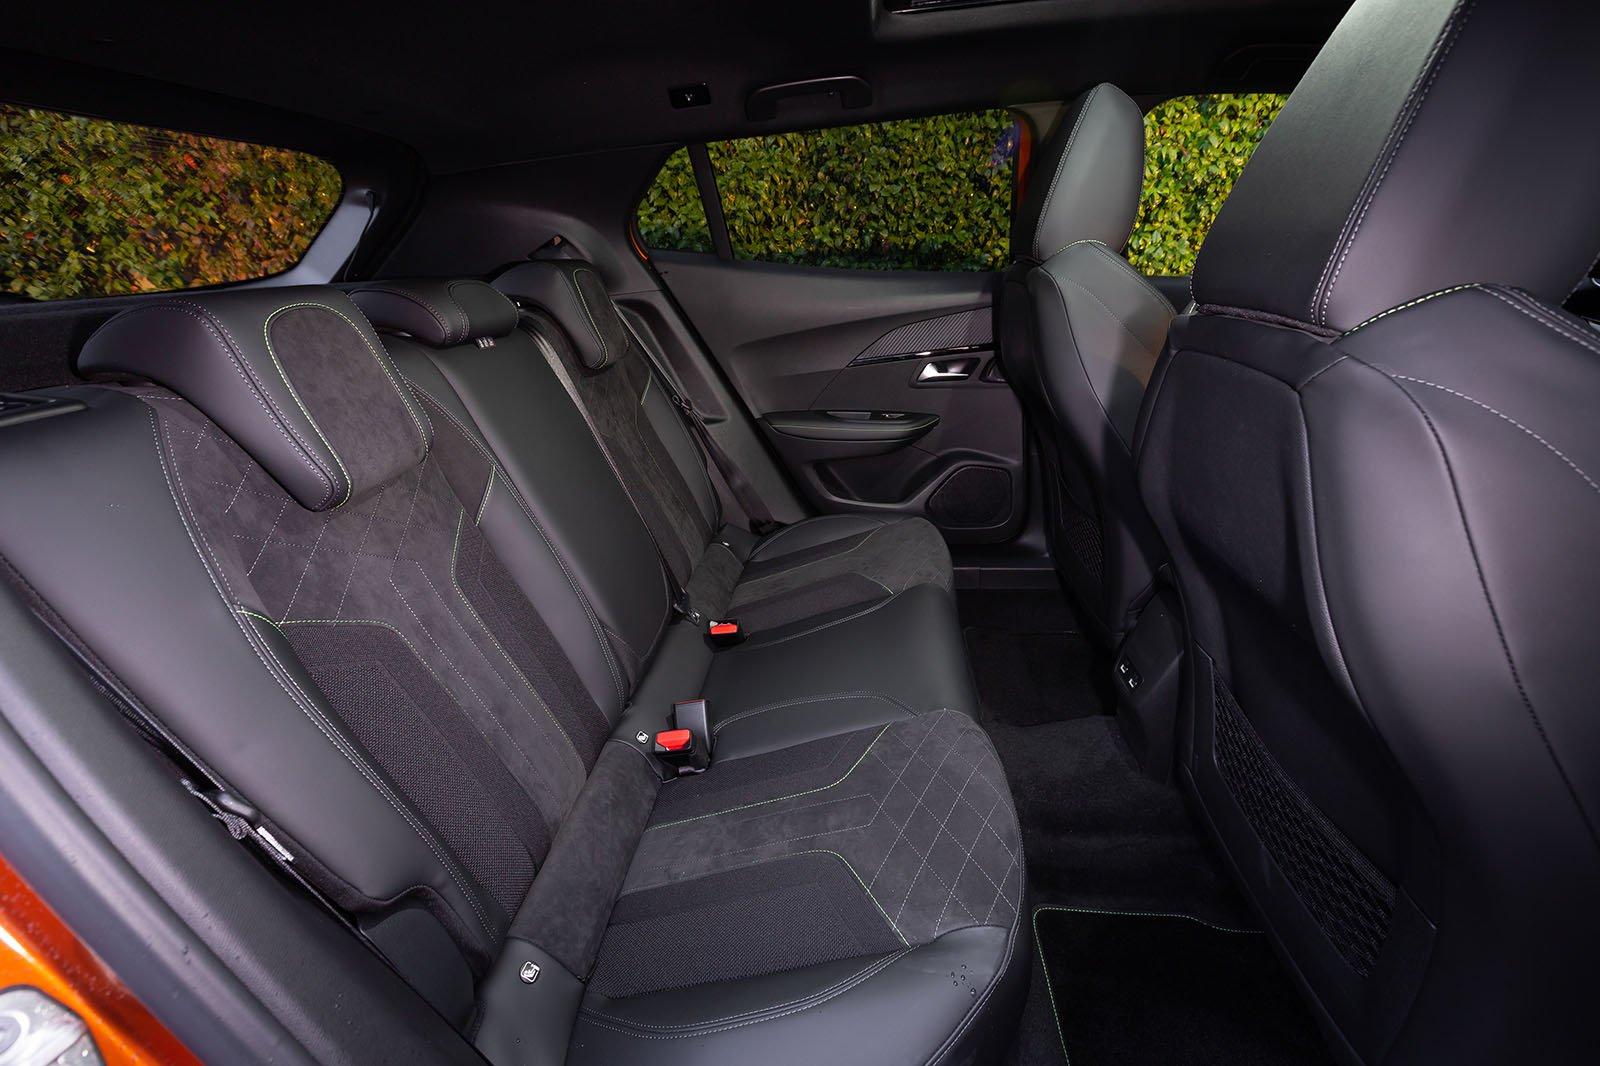 Peugeot 2008 2019 LHD rear seats